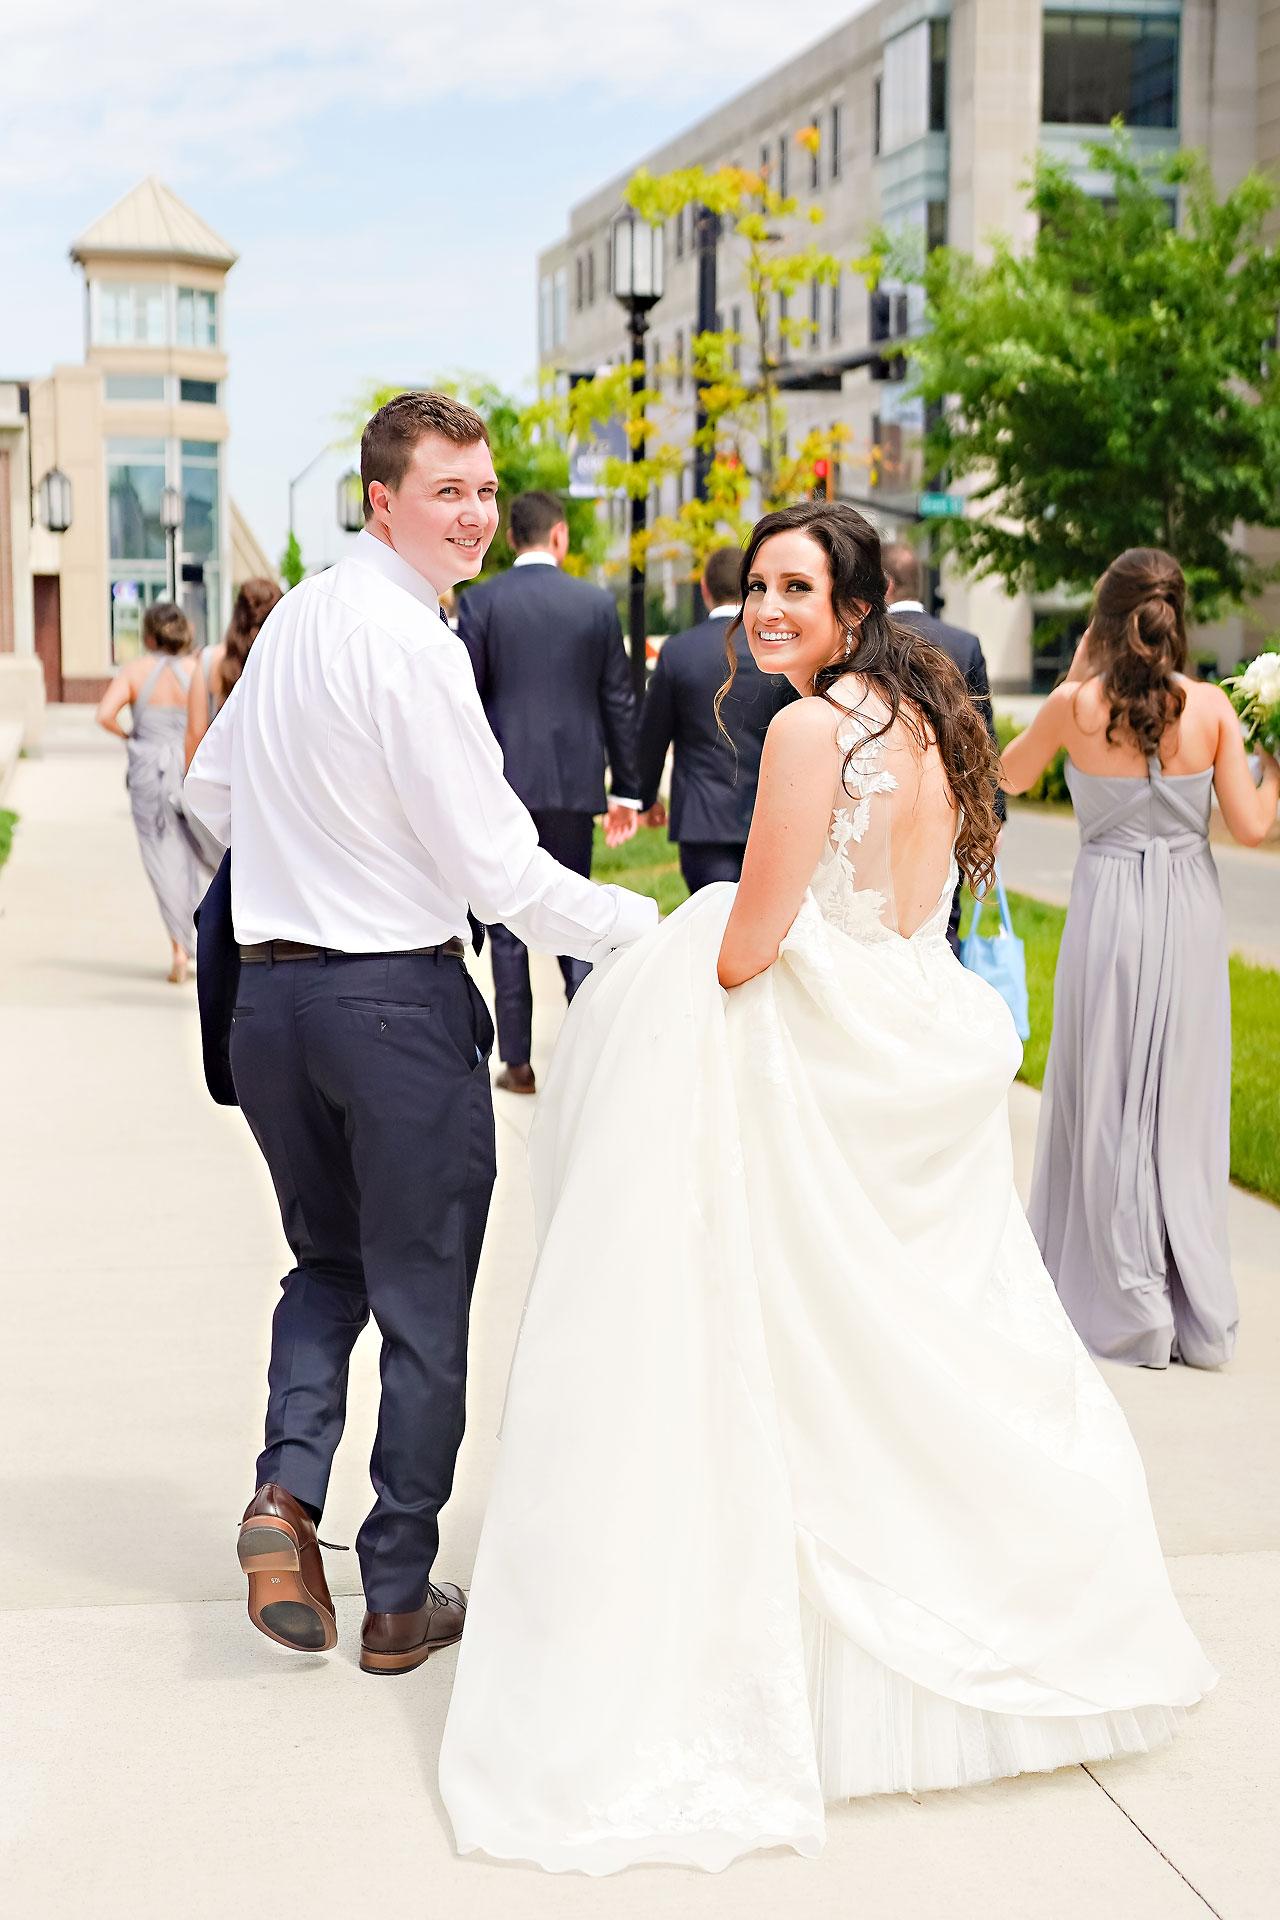 MacKinze John Lafayette Indiana Purdue Wedding 096